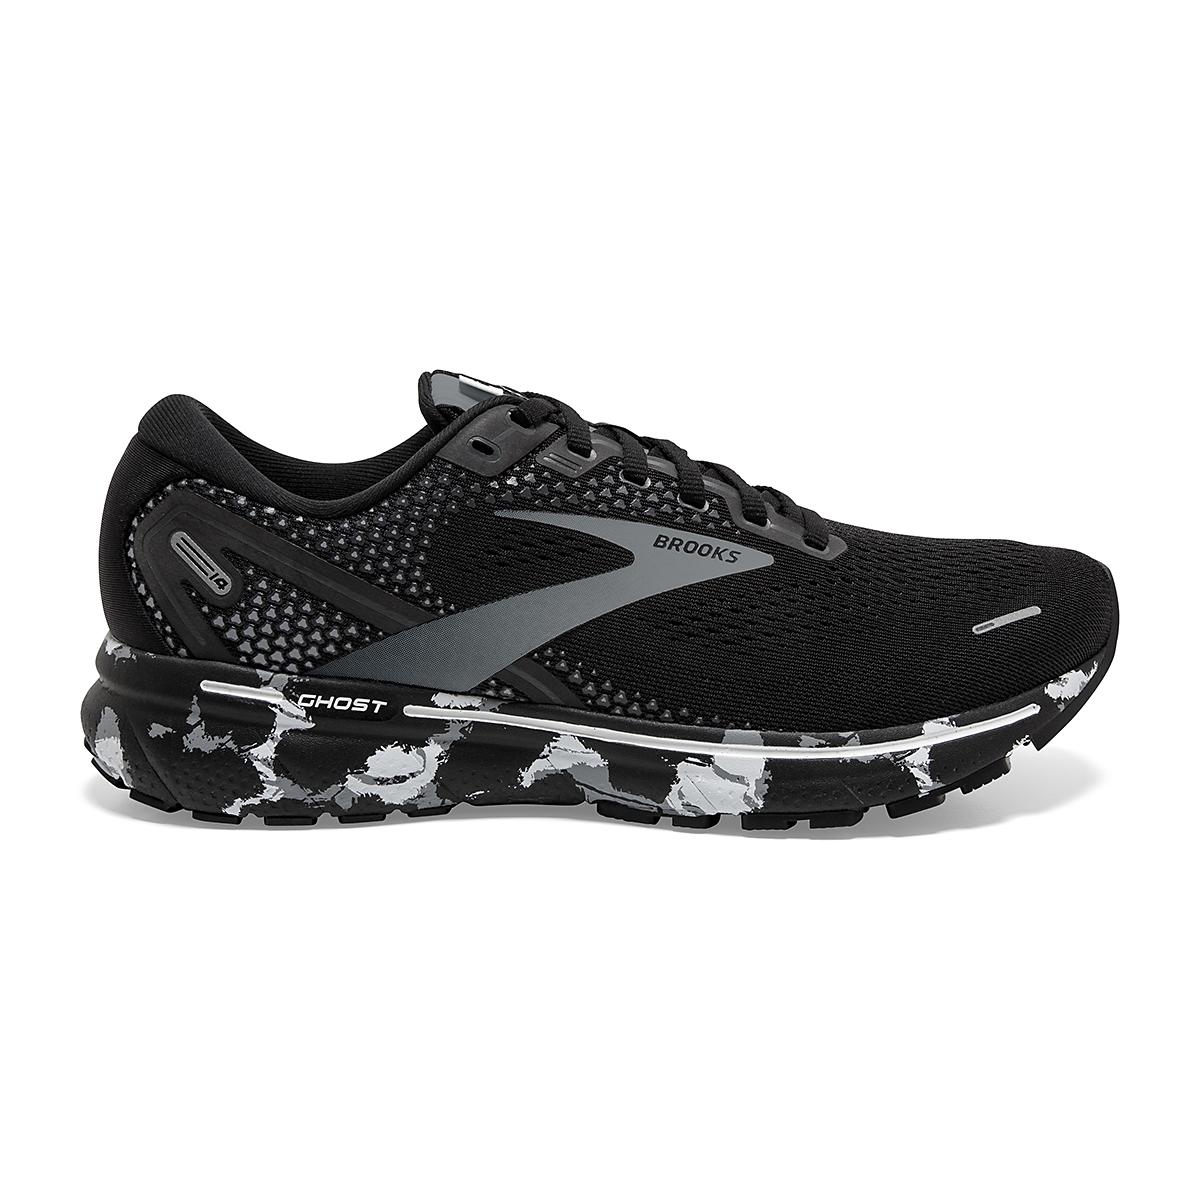 Men's Brooks Ghost 14 Running Shoe - Color: Black/Grey/White - Size: 7 - Width: Regular, Black/Grey/White, large, image 1